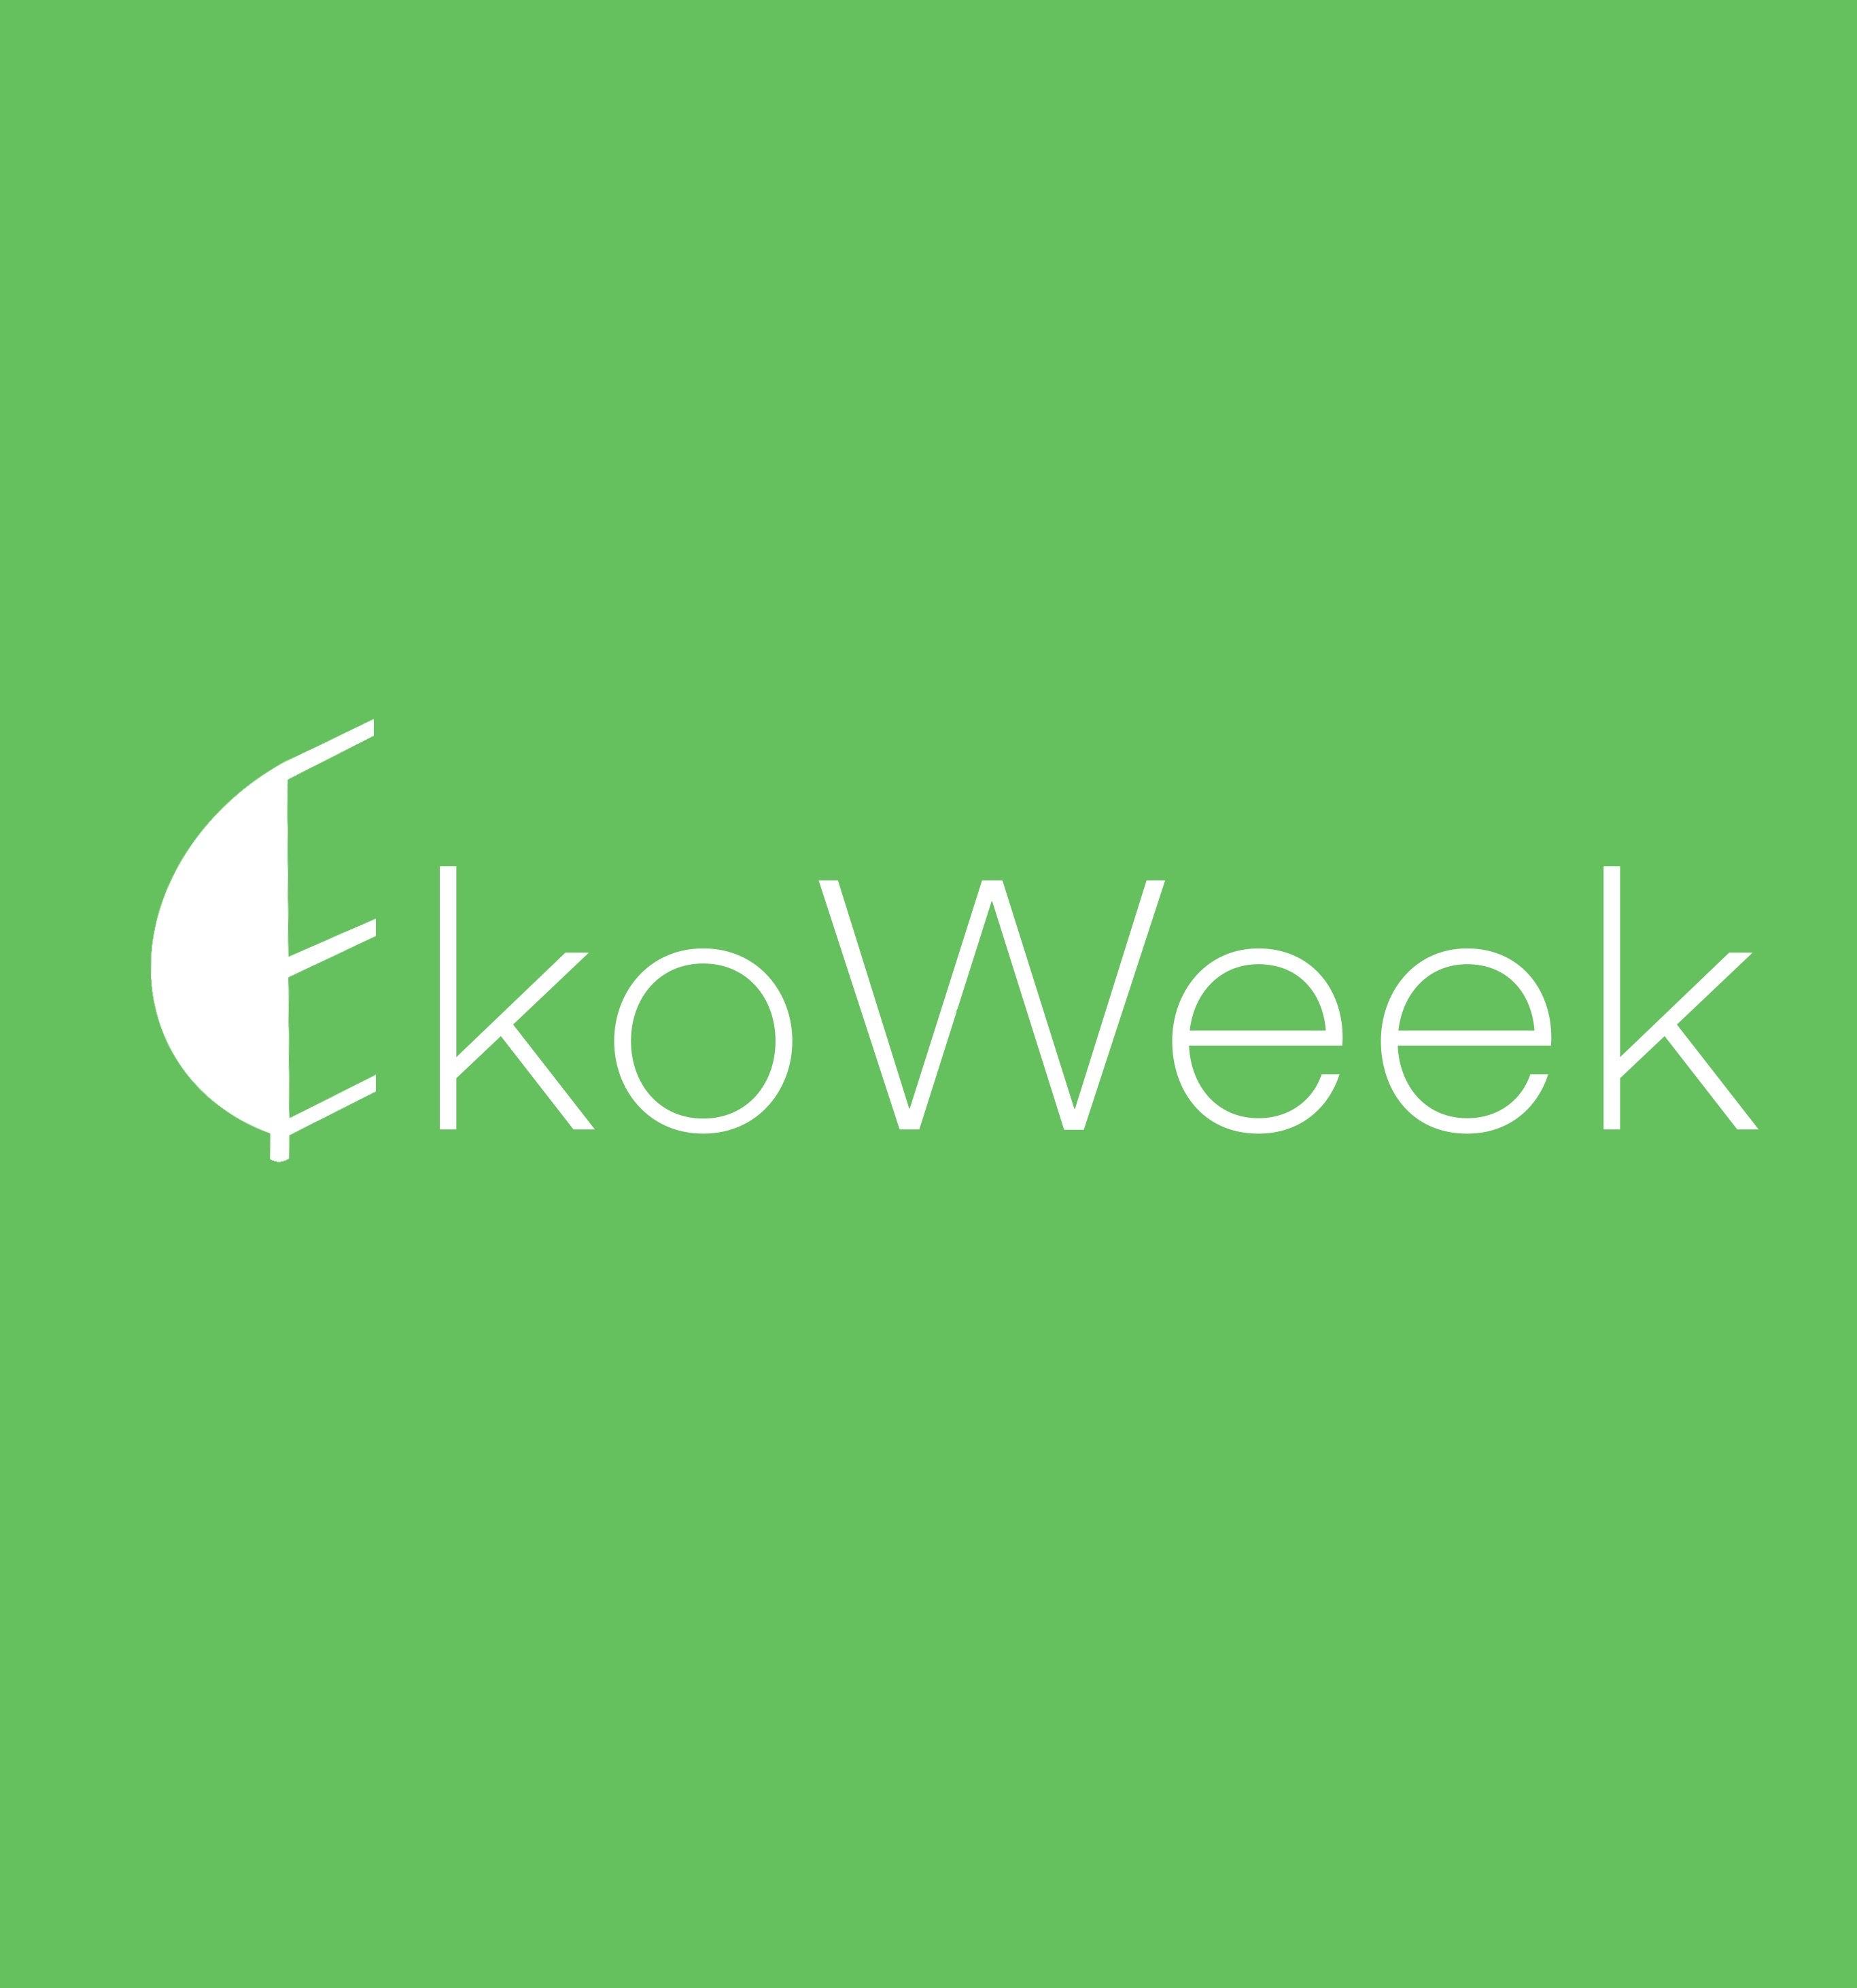 Eko Week - czas start!